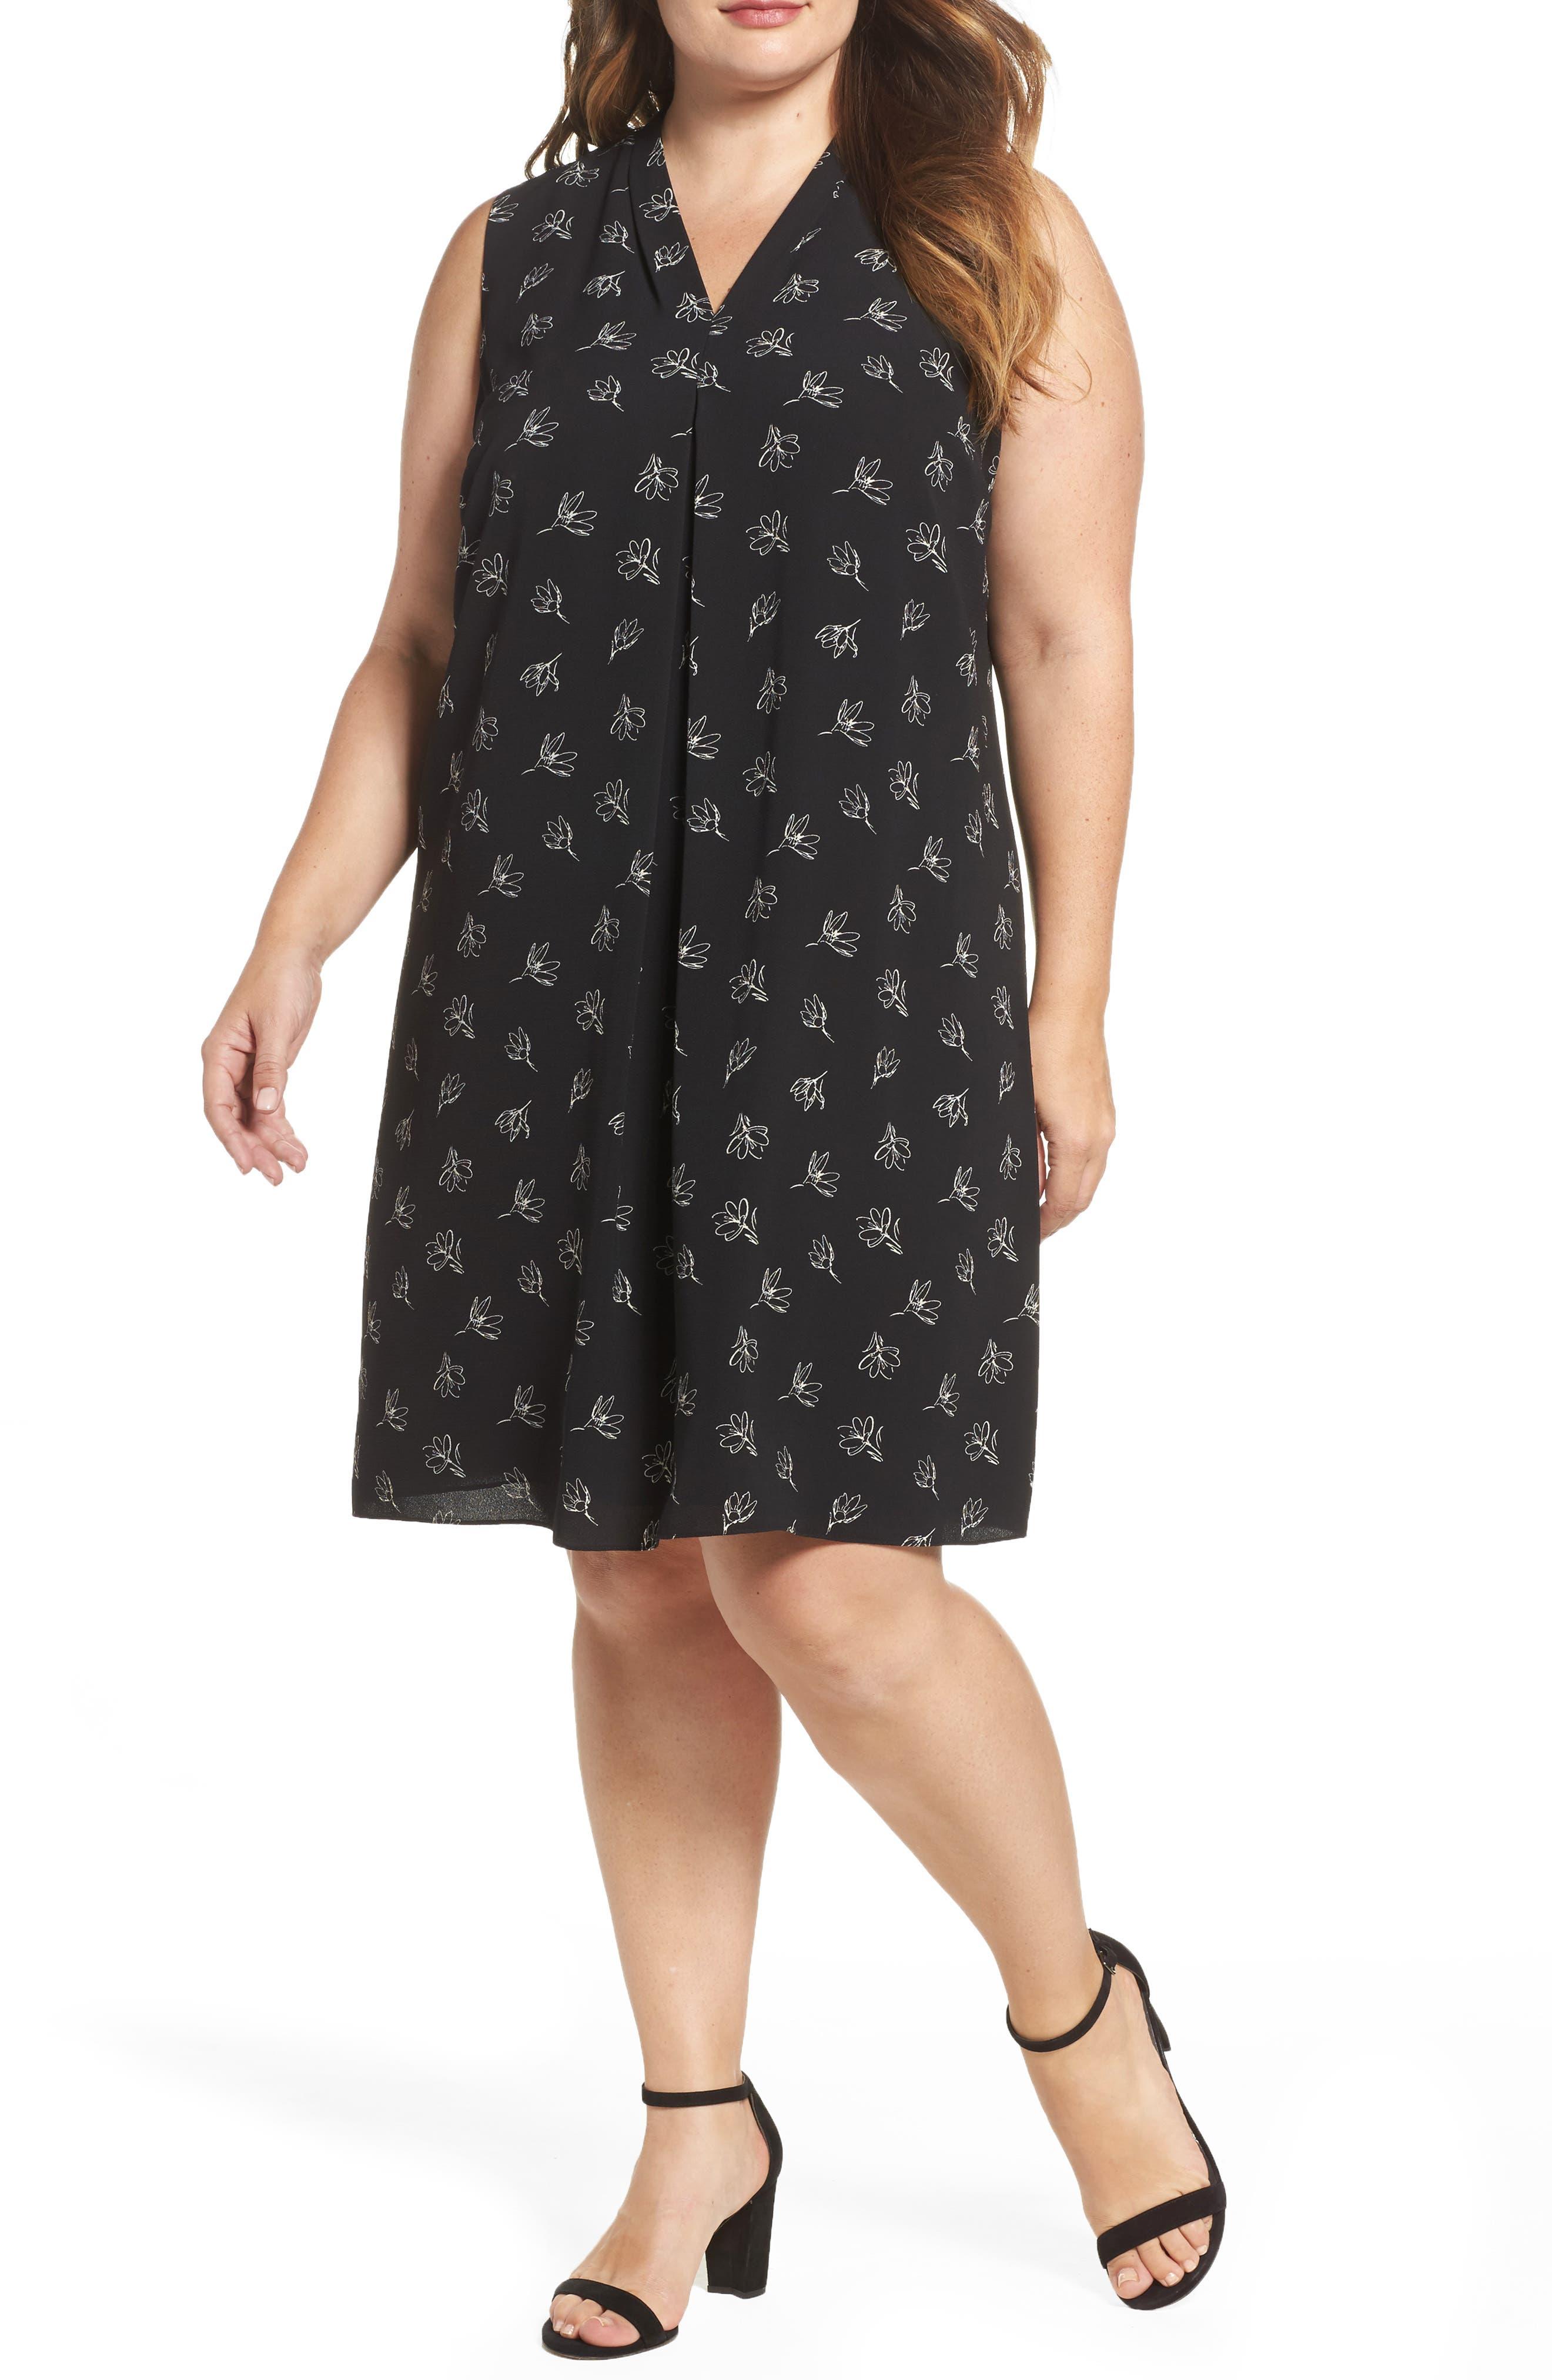 Main Image - Vince Camuto Fluent Flowers Inverted Pleat Shift Dress (Plus Size)